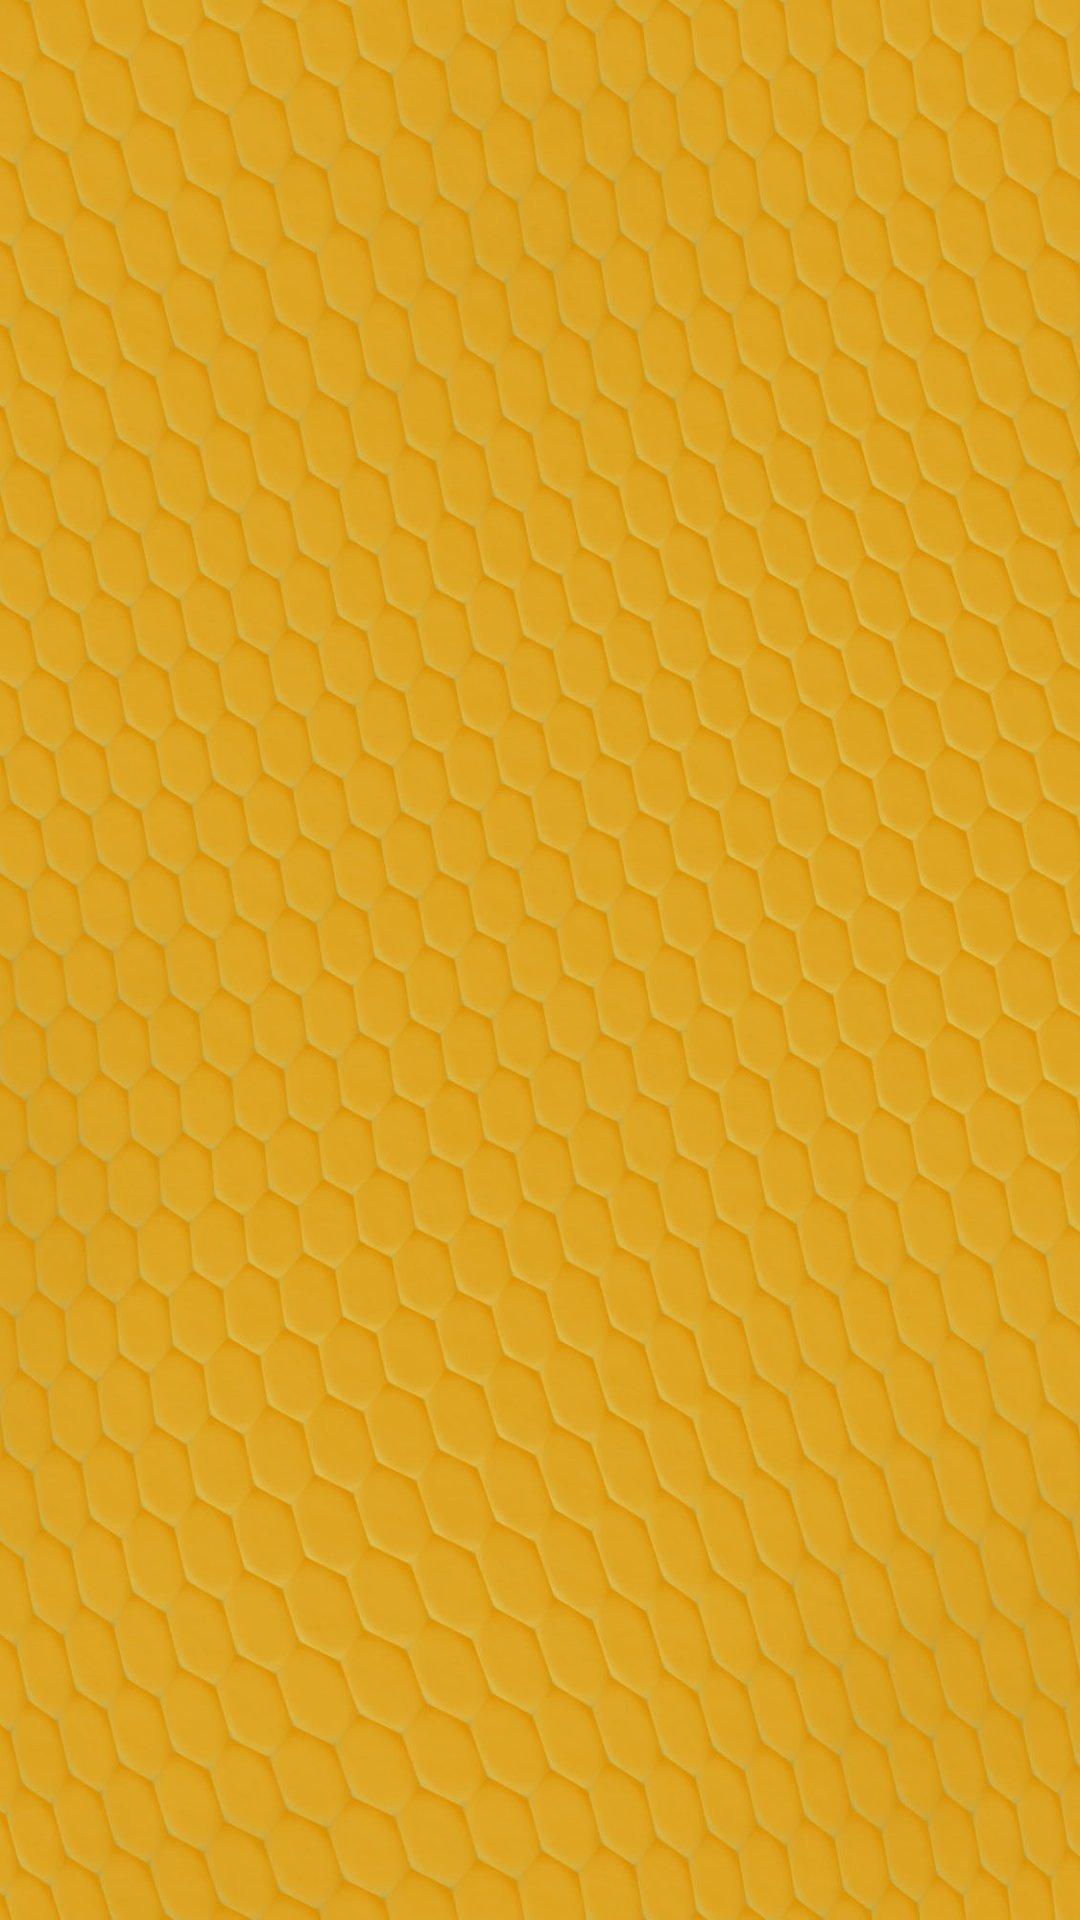 Wallpaper 891843